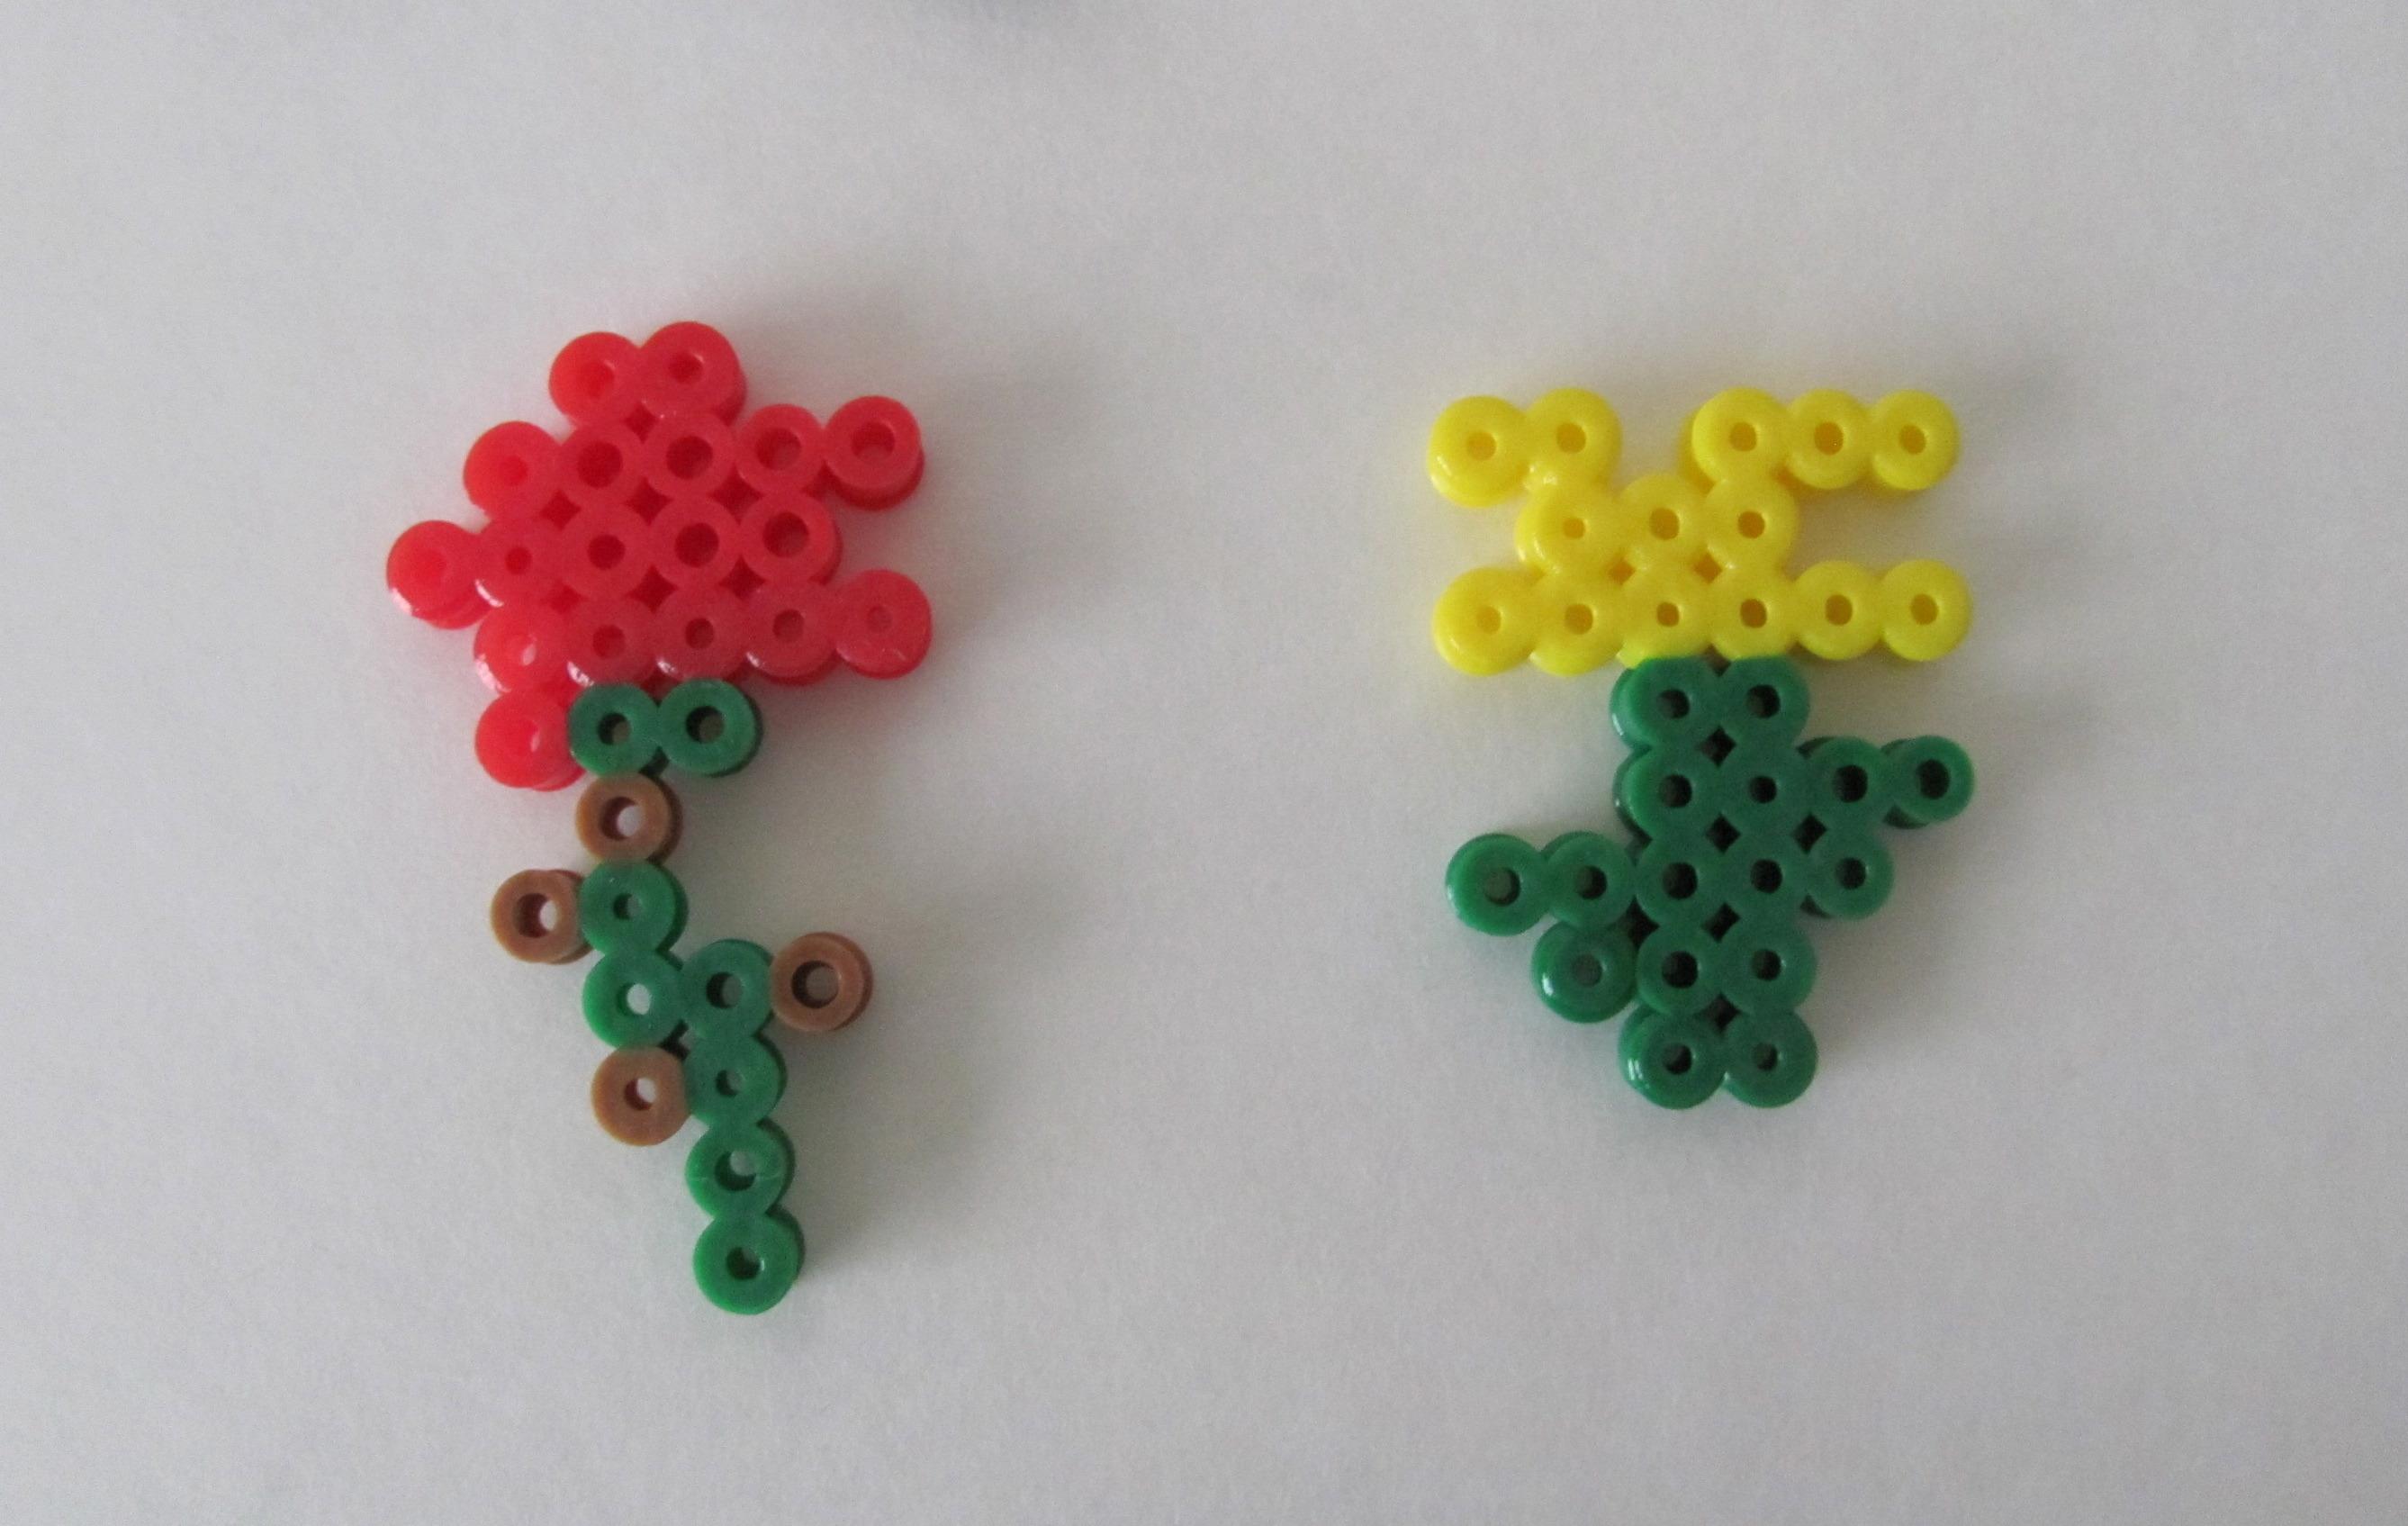 minecraft perler beads bow and arrow